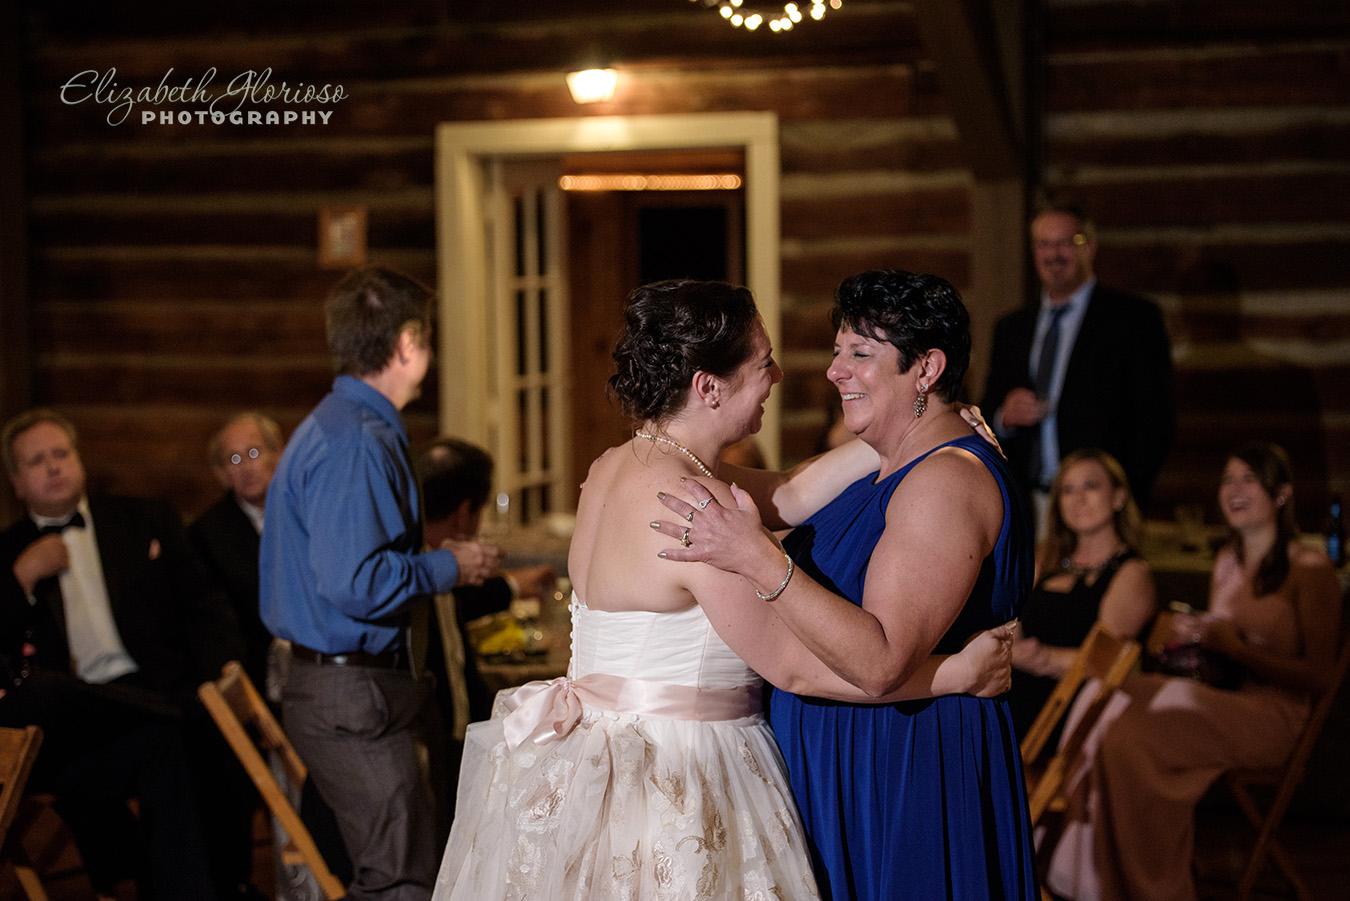 Vermilion_wedding_Glorioso Photography_1047